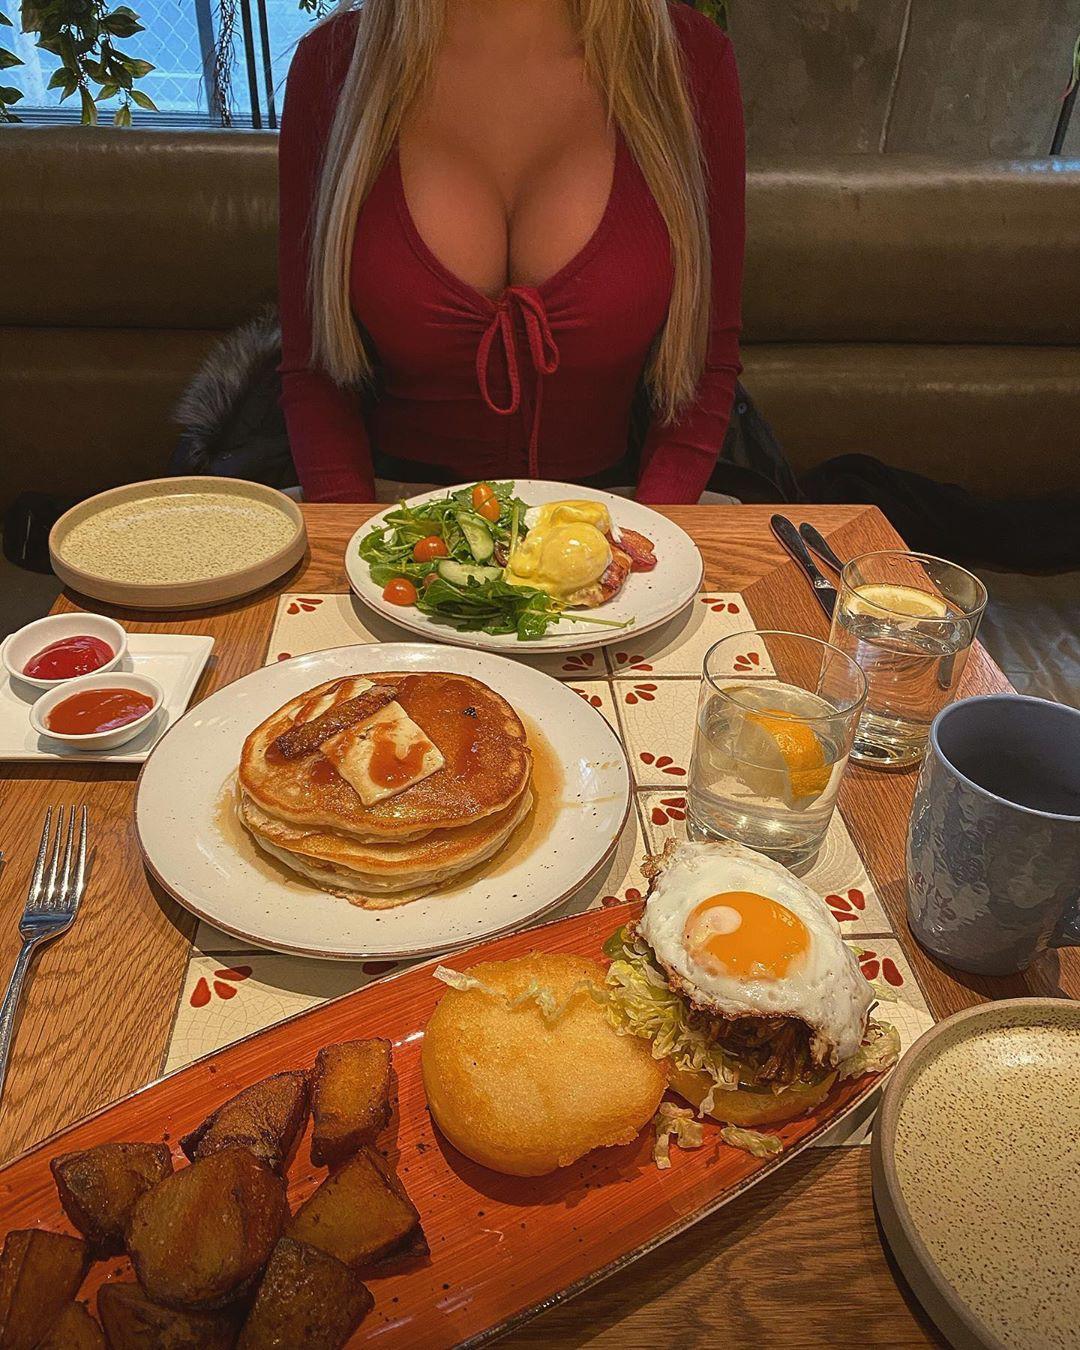 Natalie Gauvreau, full breakfast, ingredient, serveware